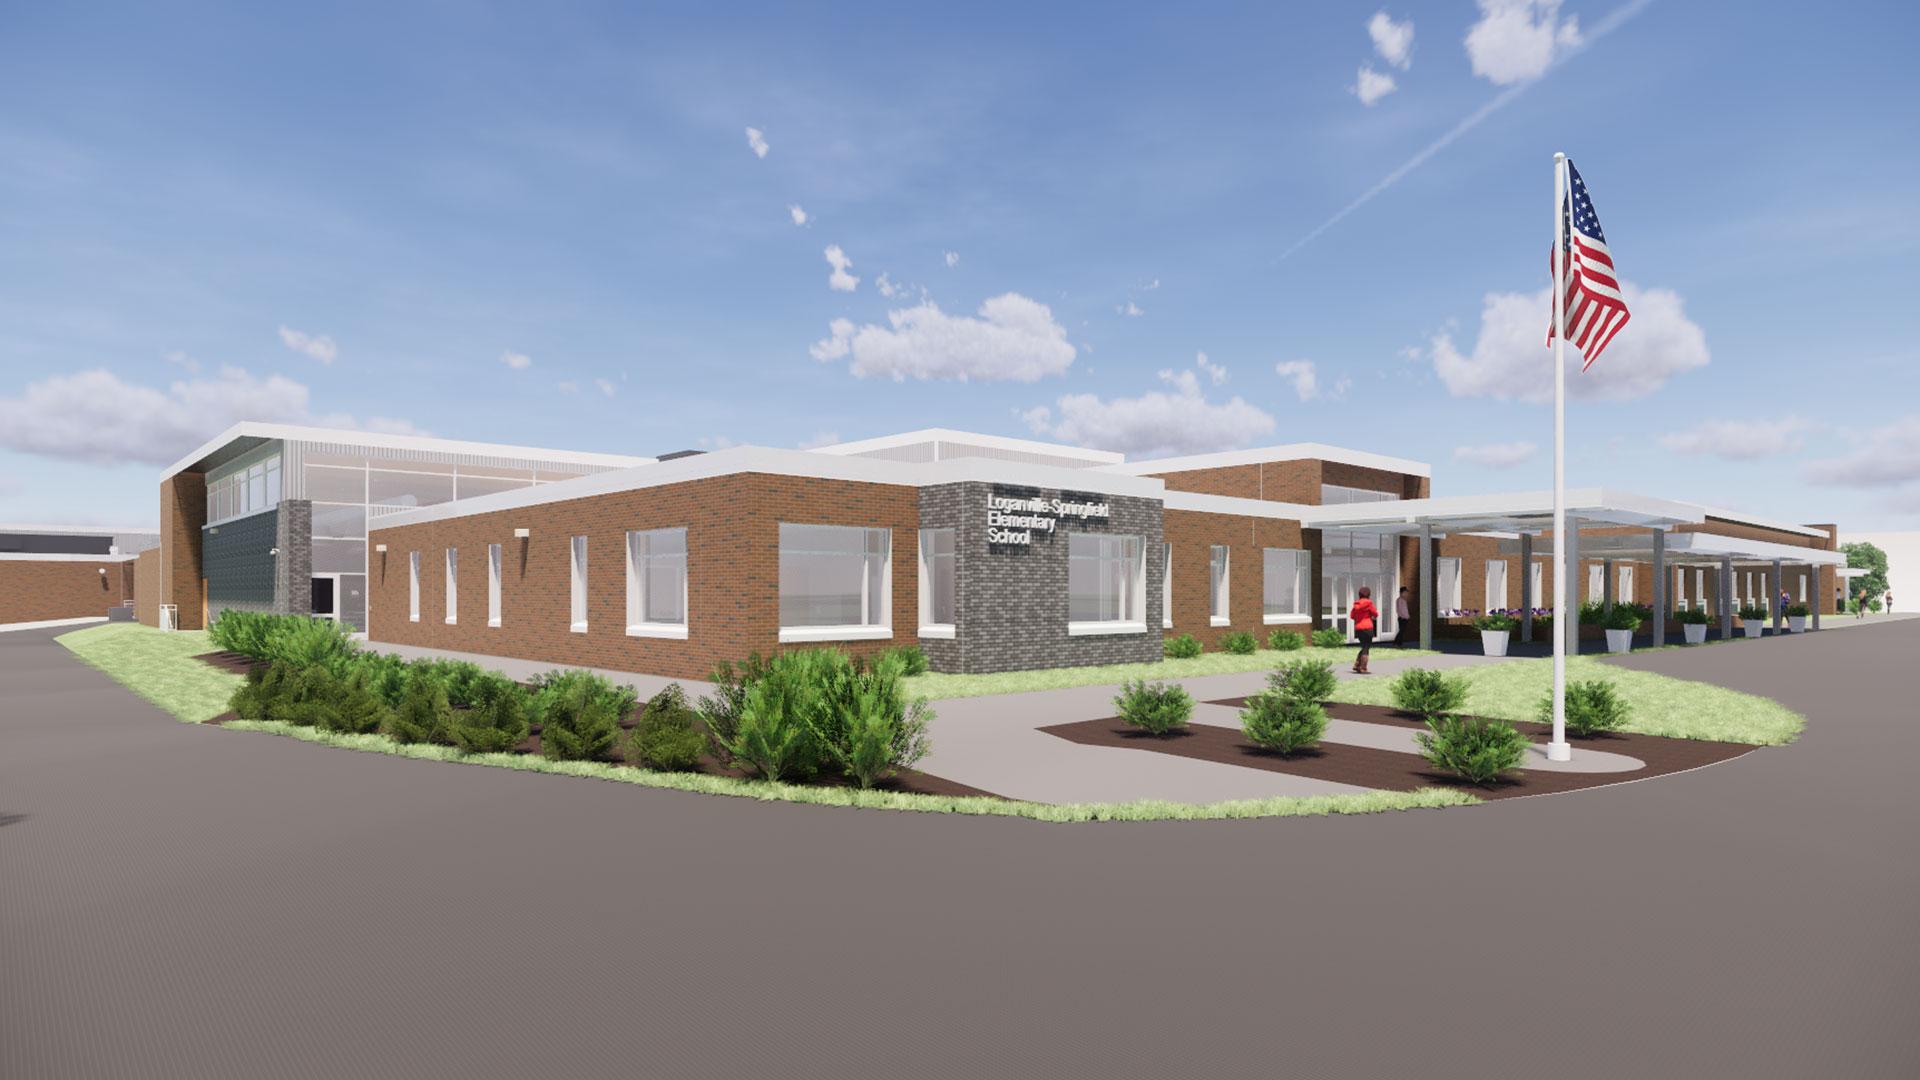 Loganville-Springfield Elementary School, Dallastown Area School District